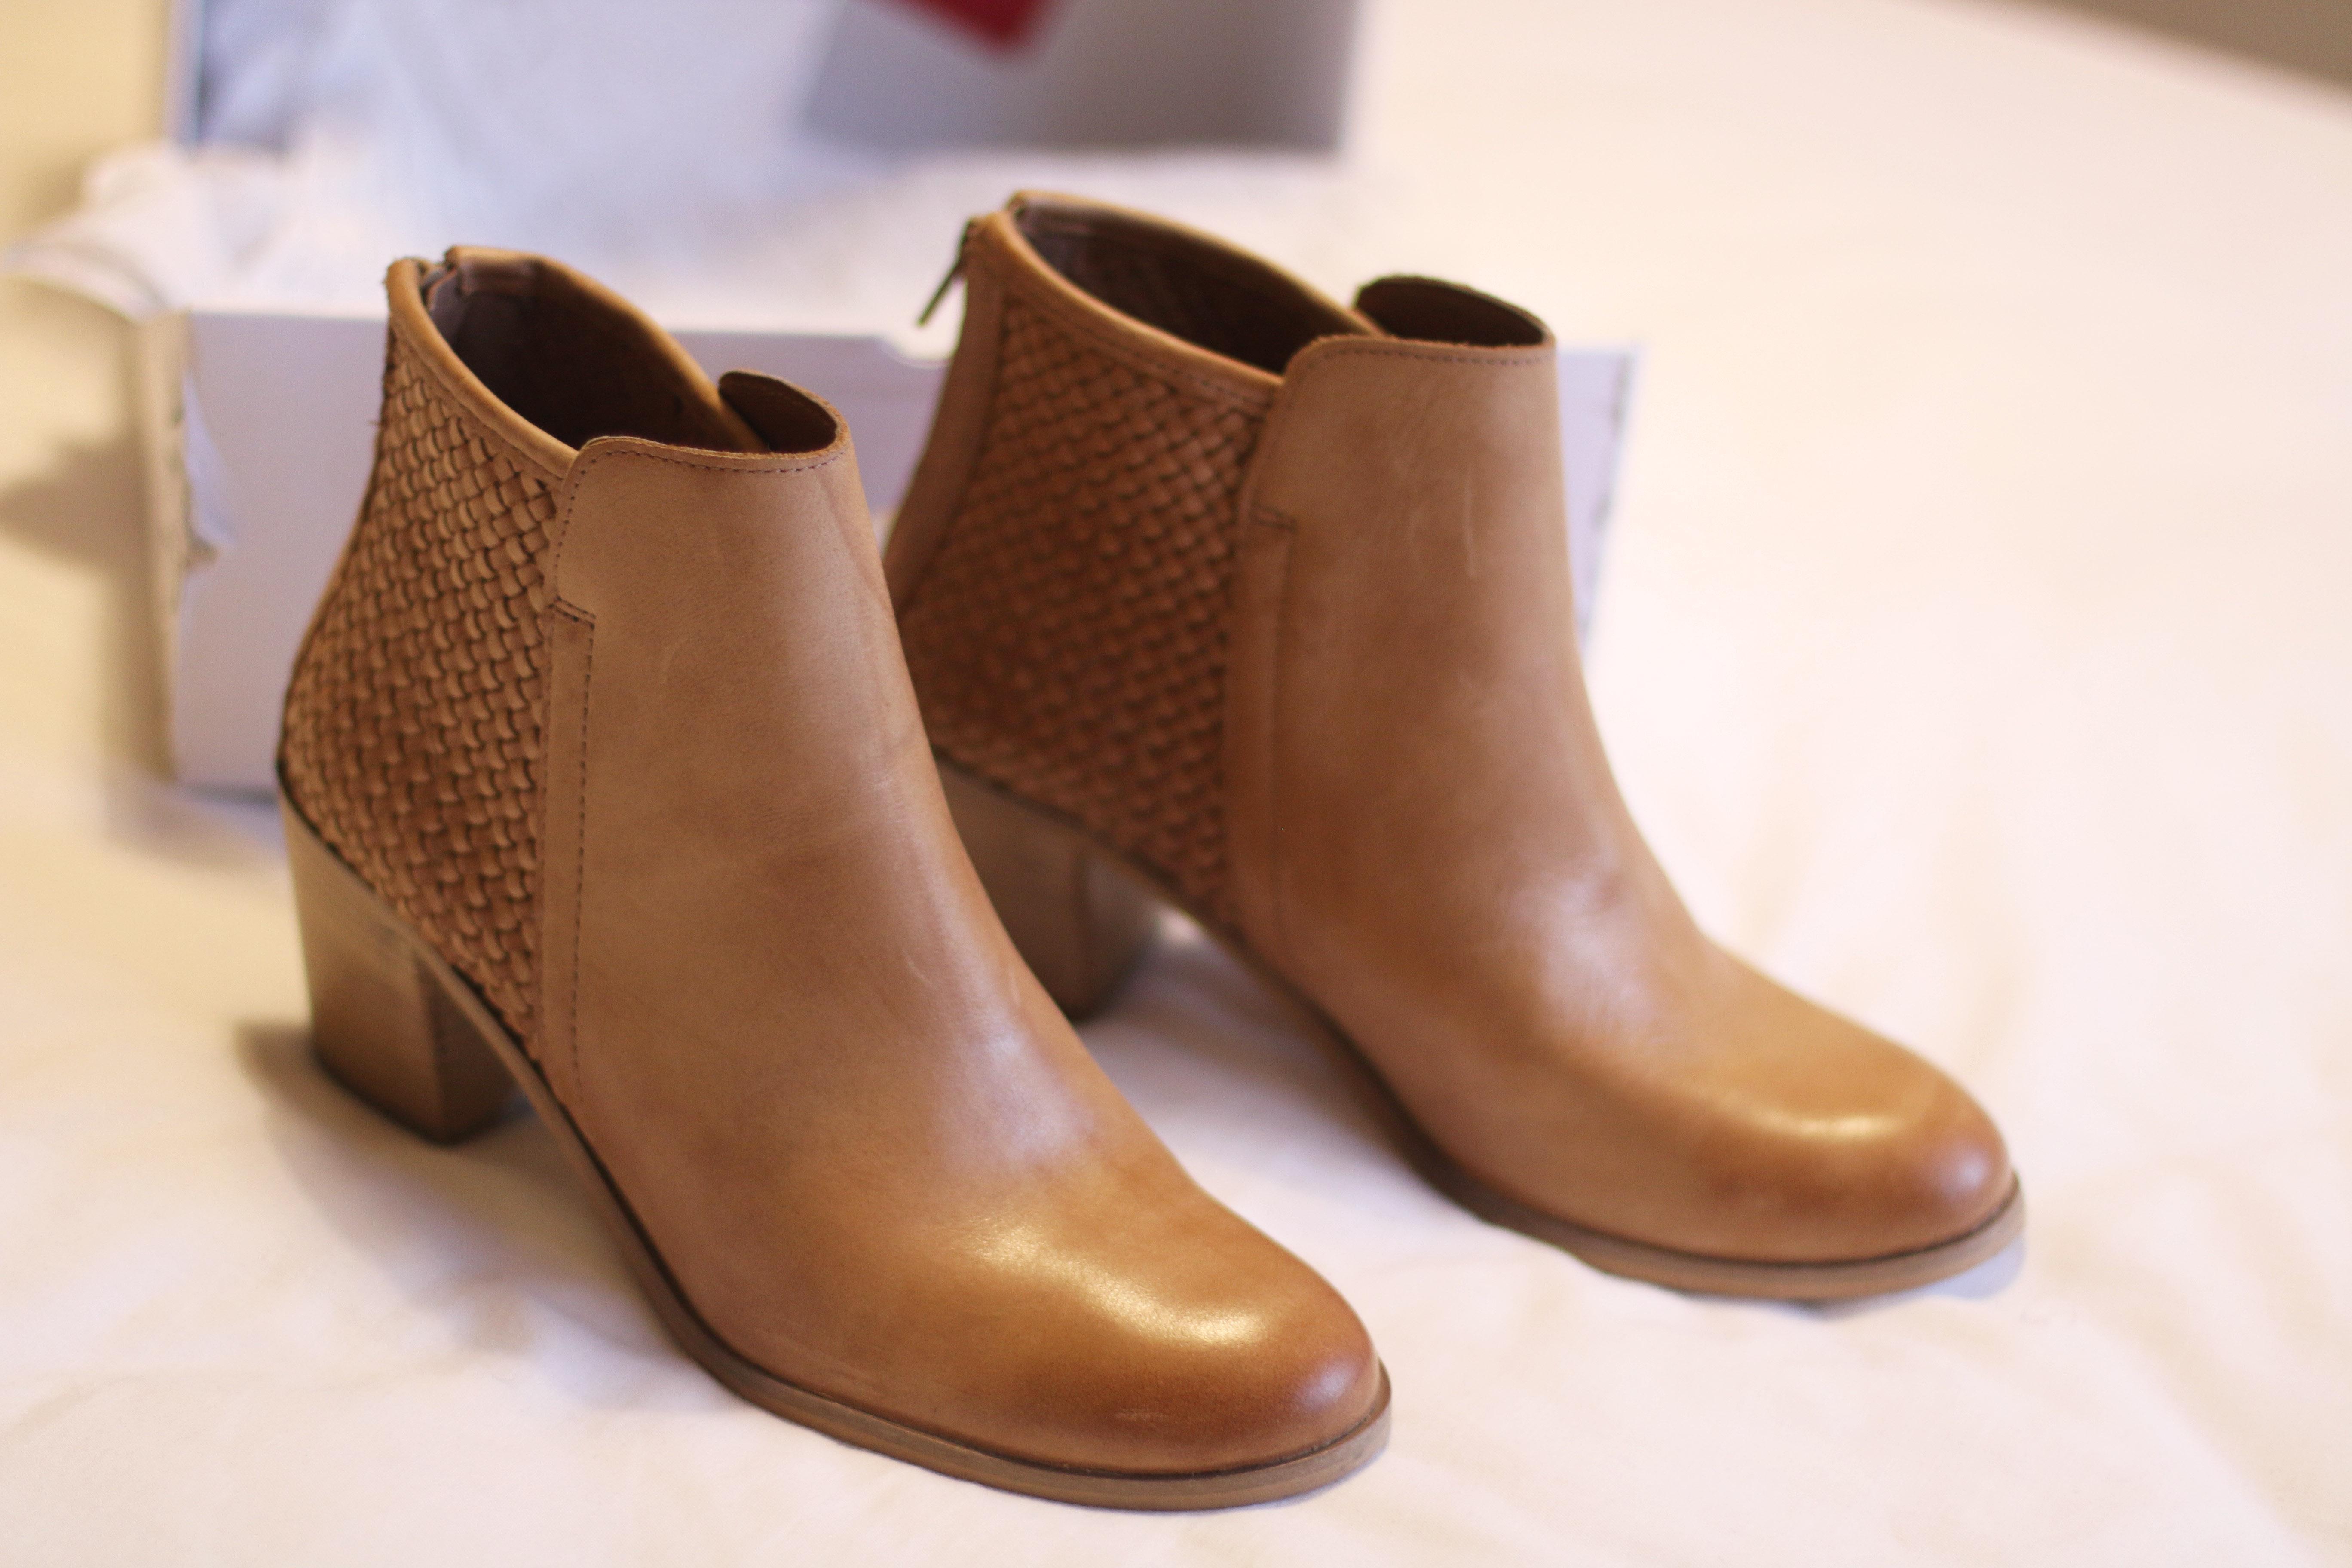 Aldo Tan Ankle Boots Bailey Schneider